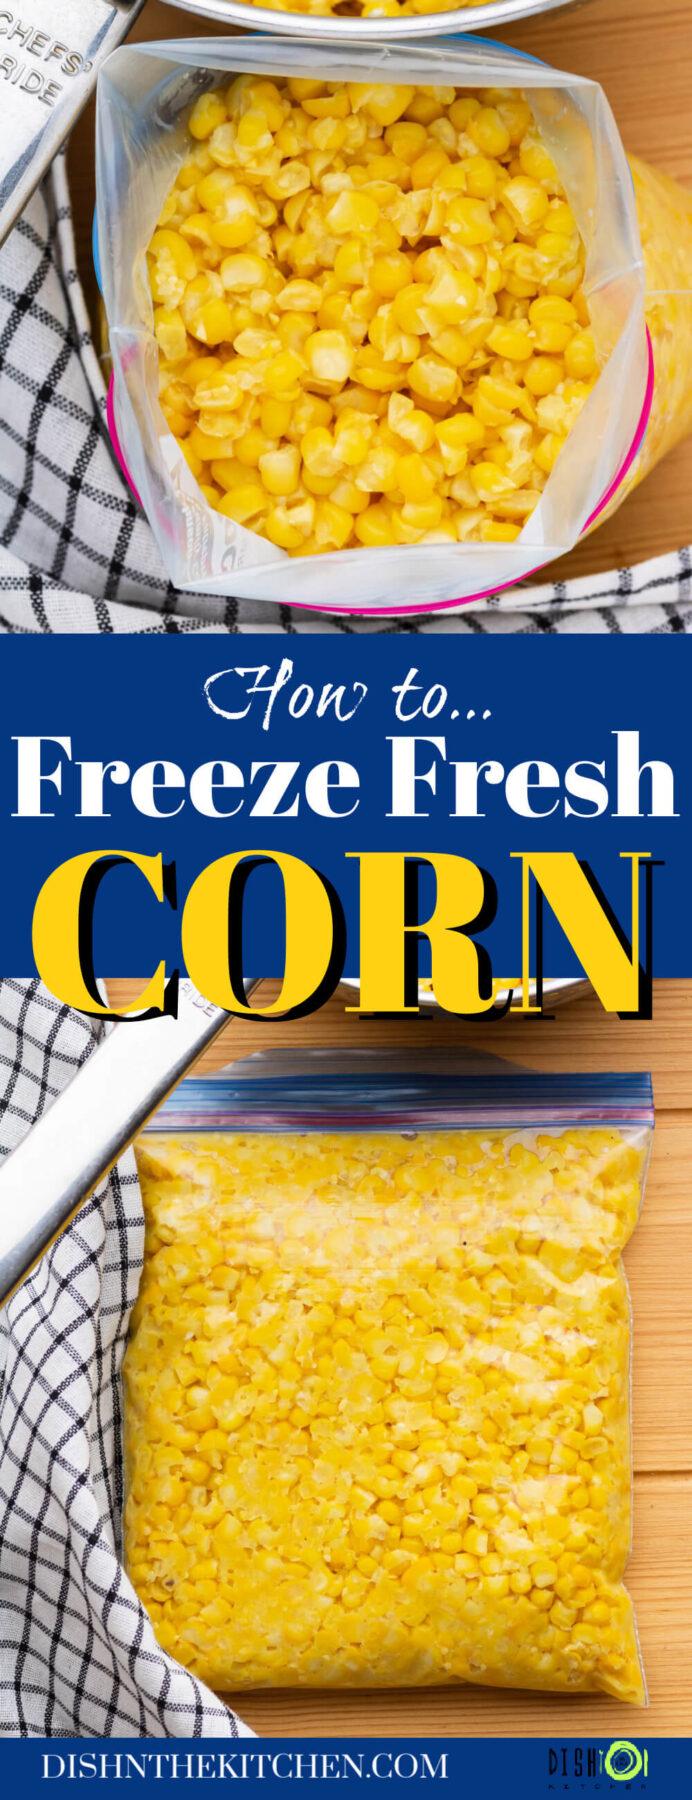 Pinterest image featuring a freezer bag full of bright yellow corn kernels beside a saucepan of corn.